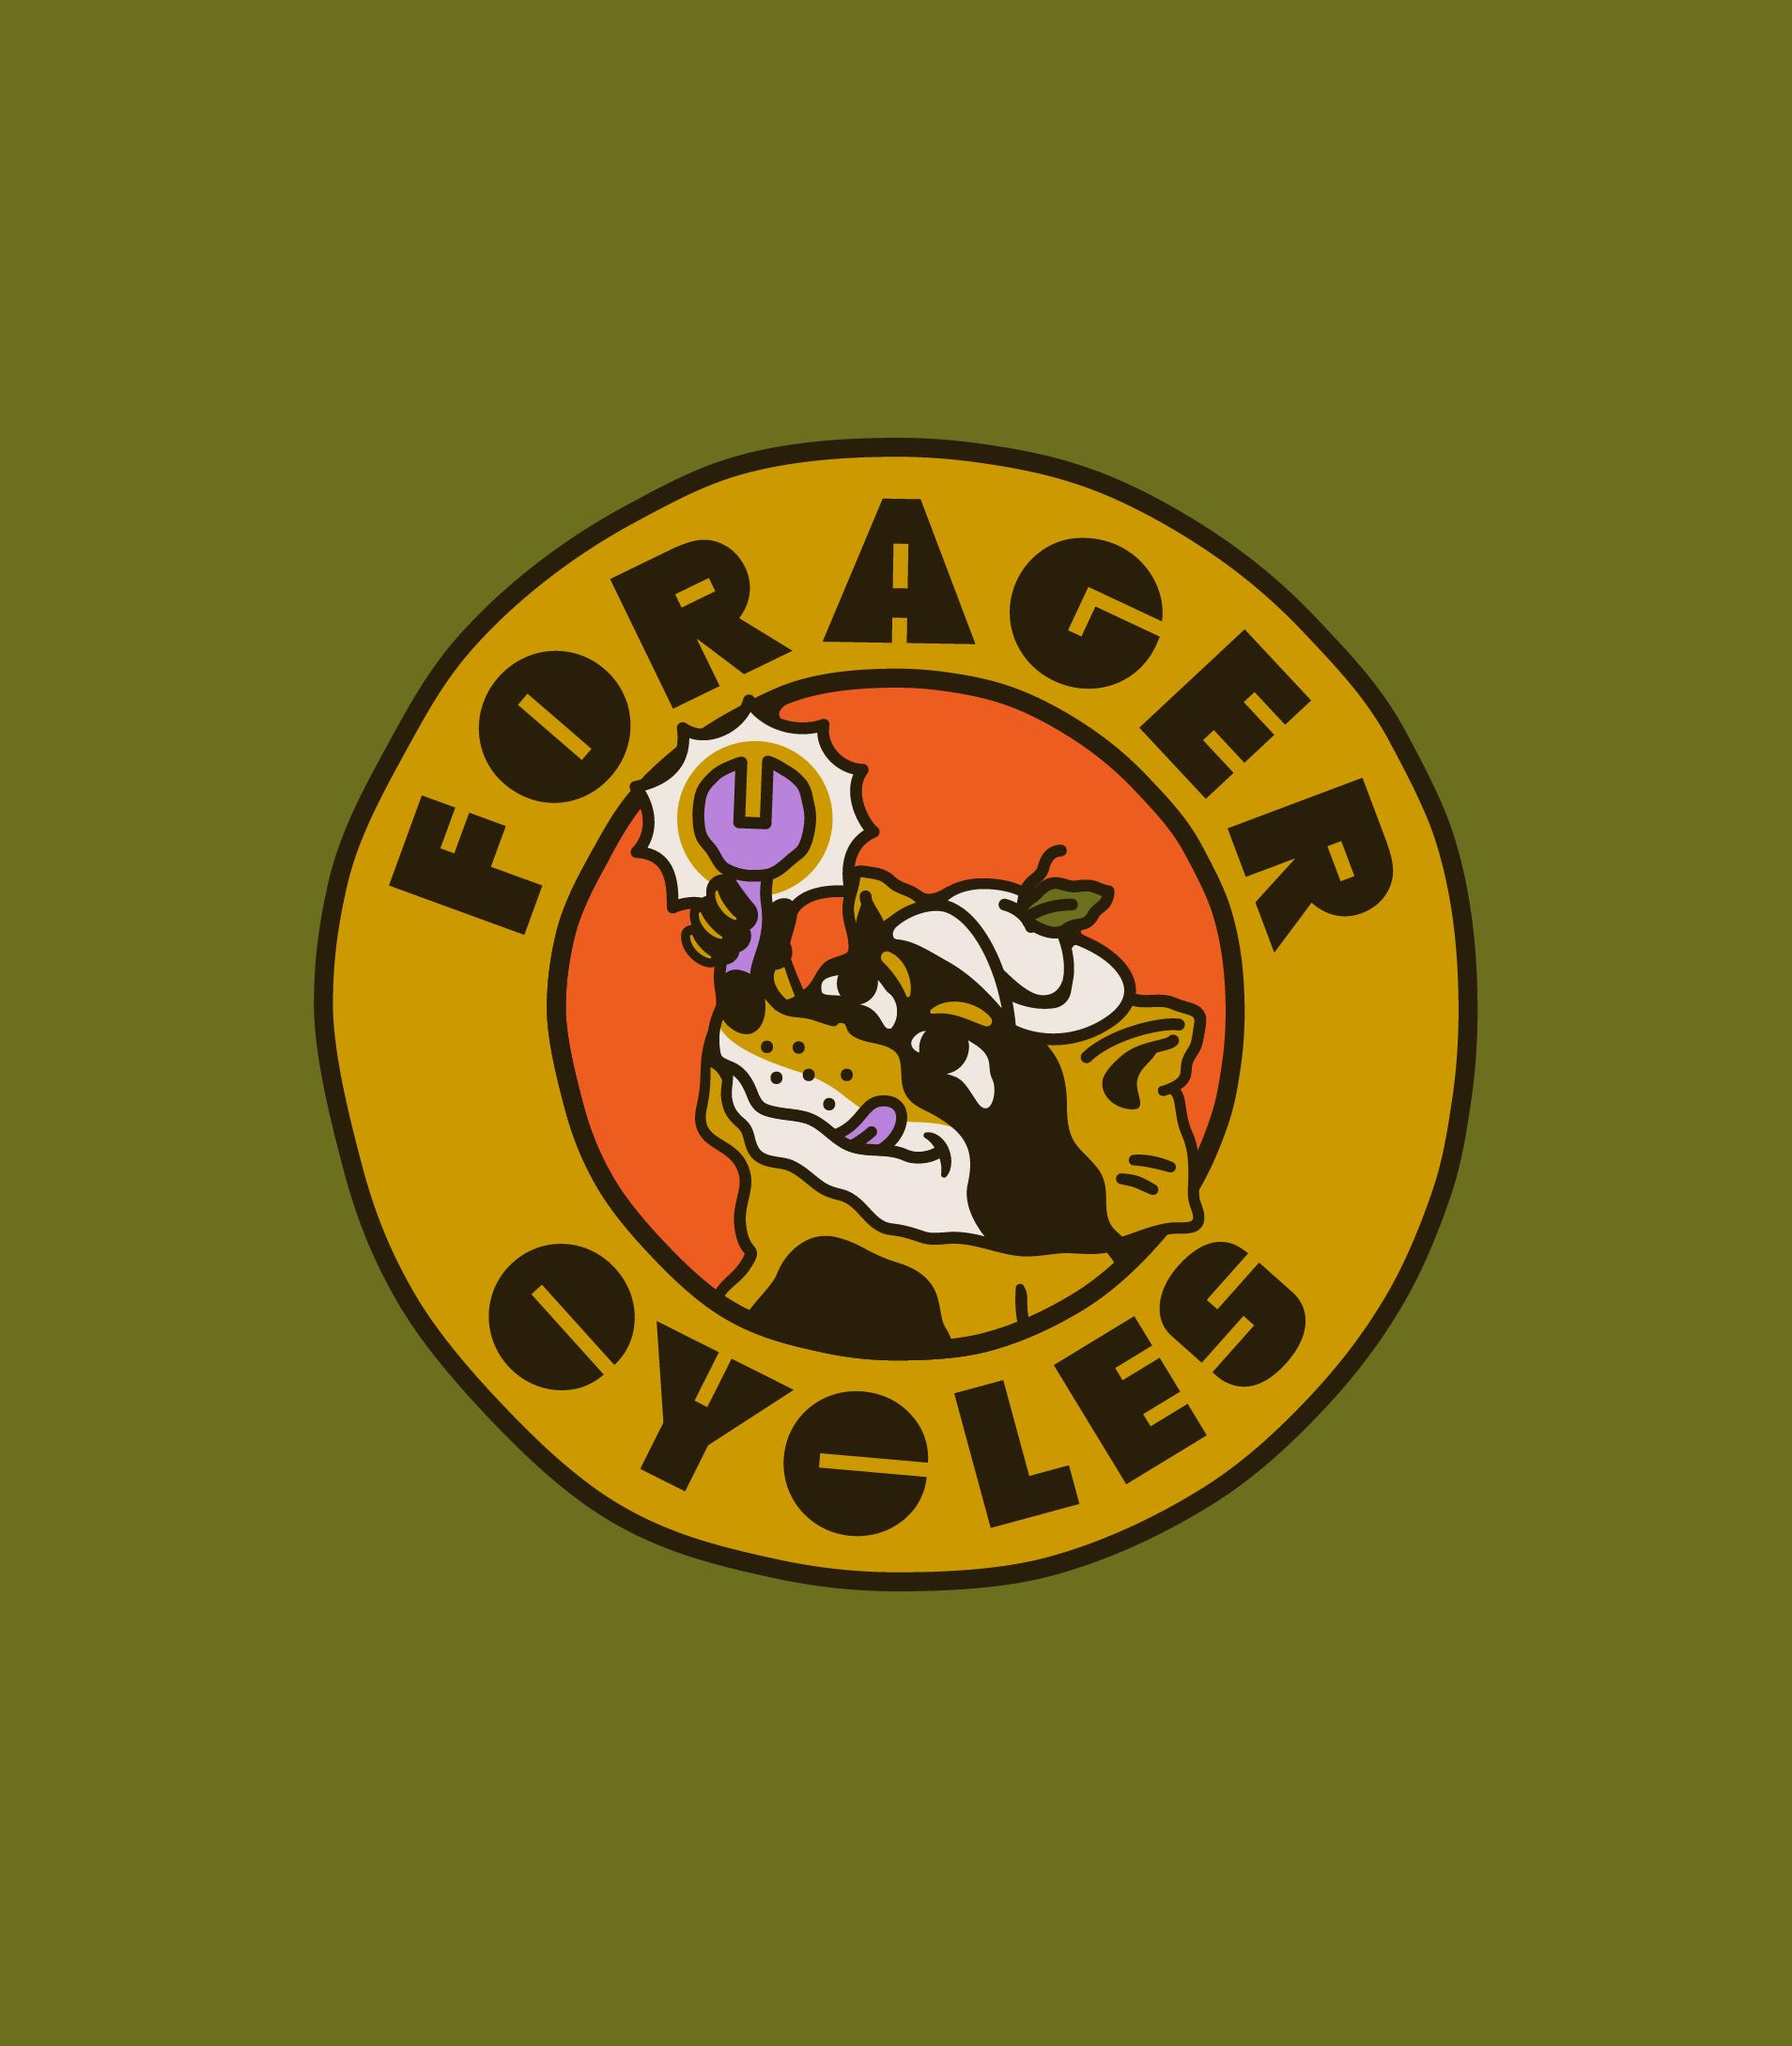 2-logo-2